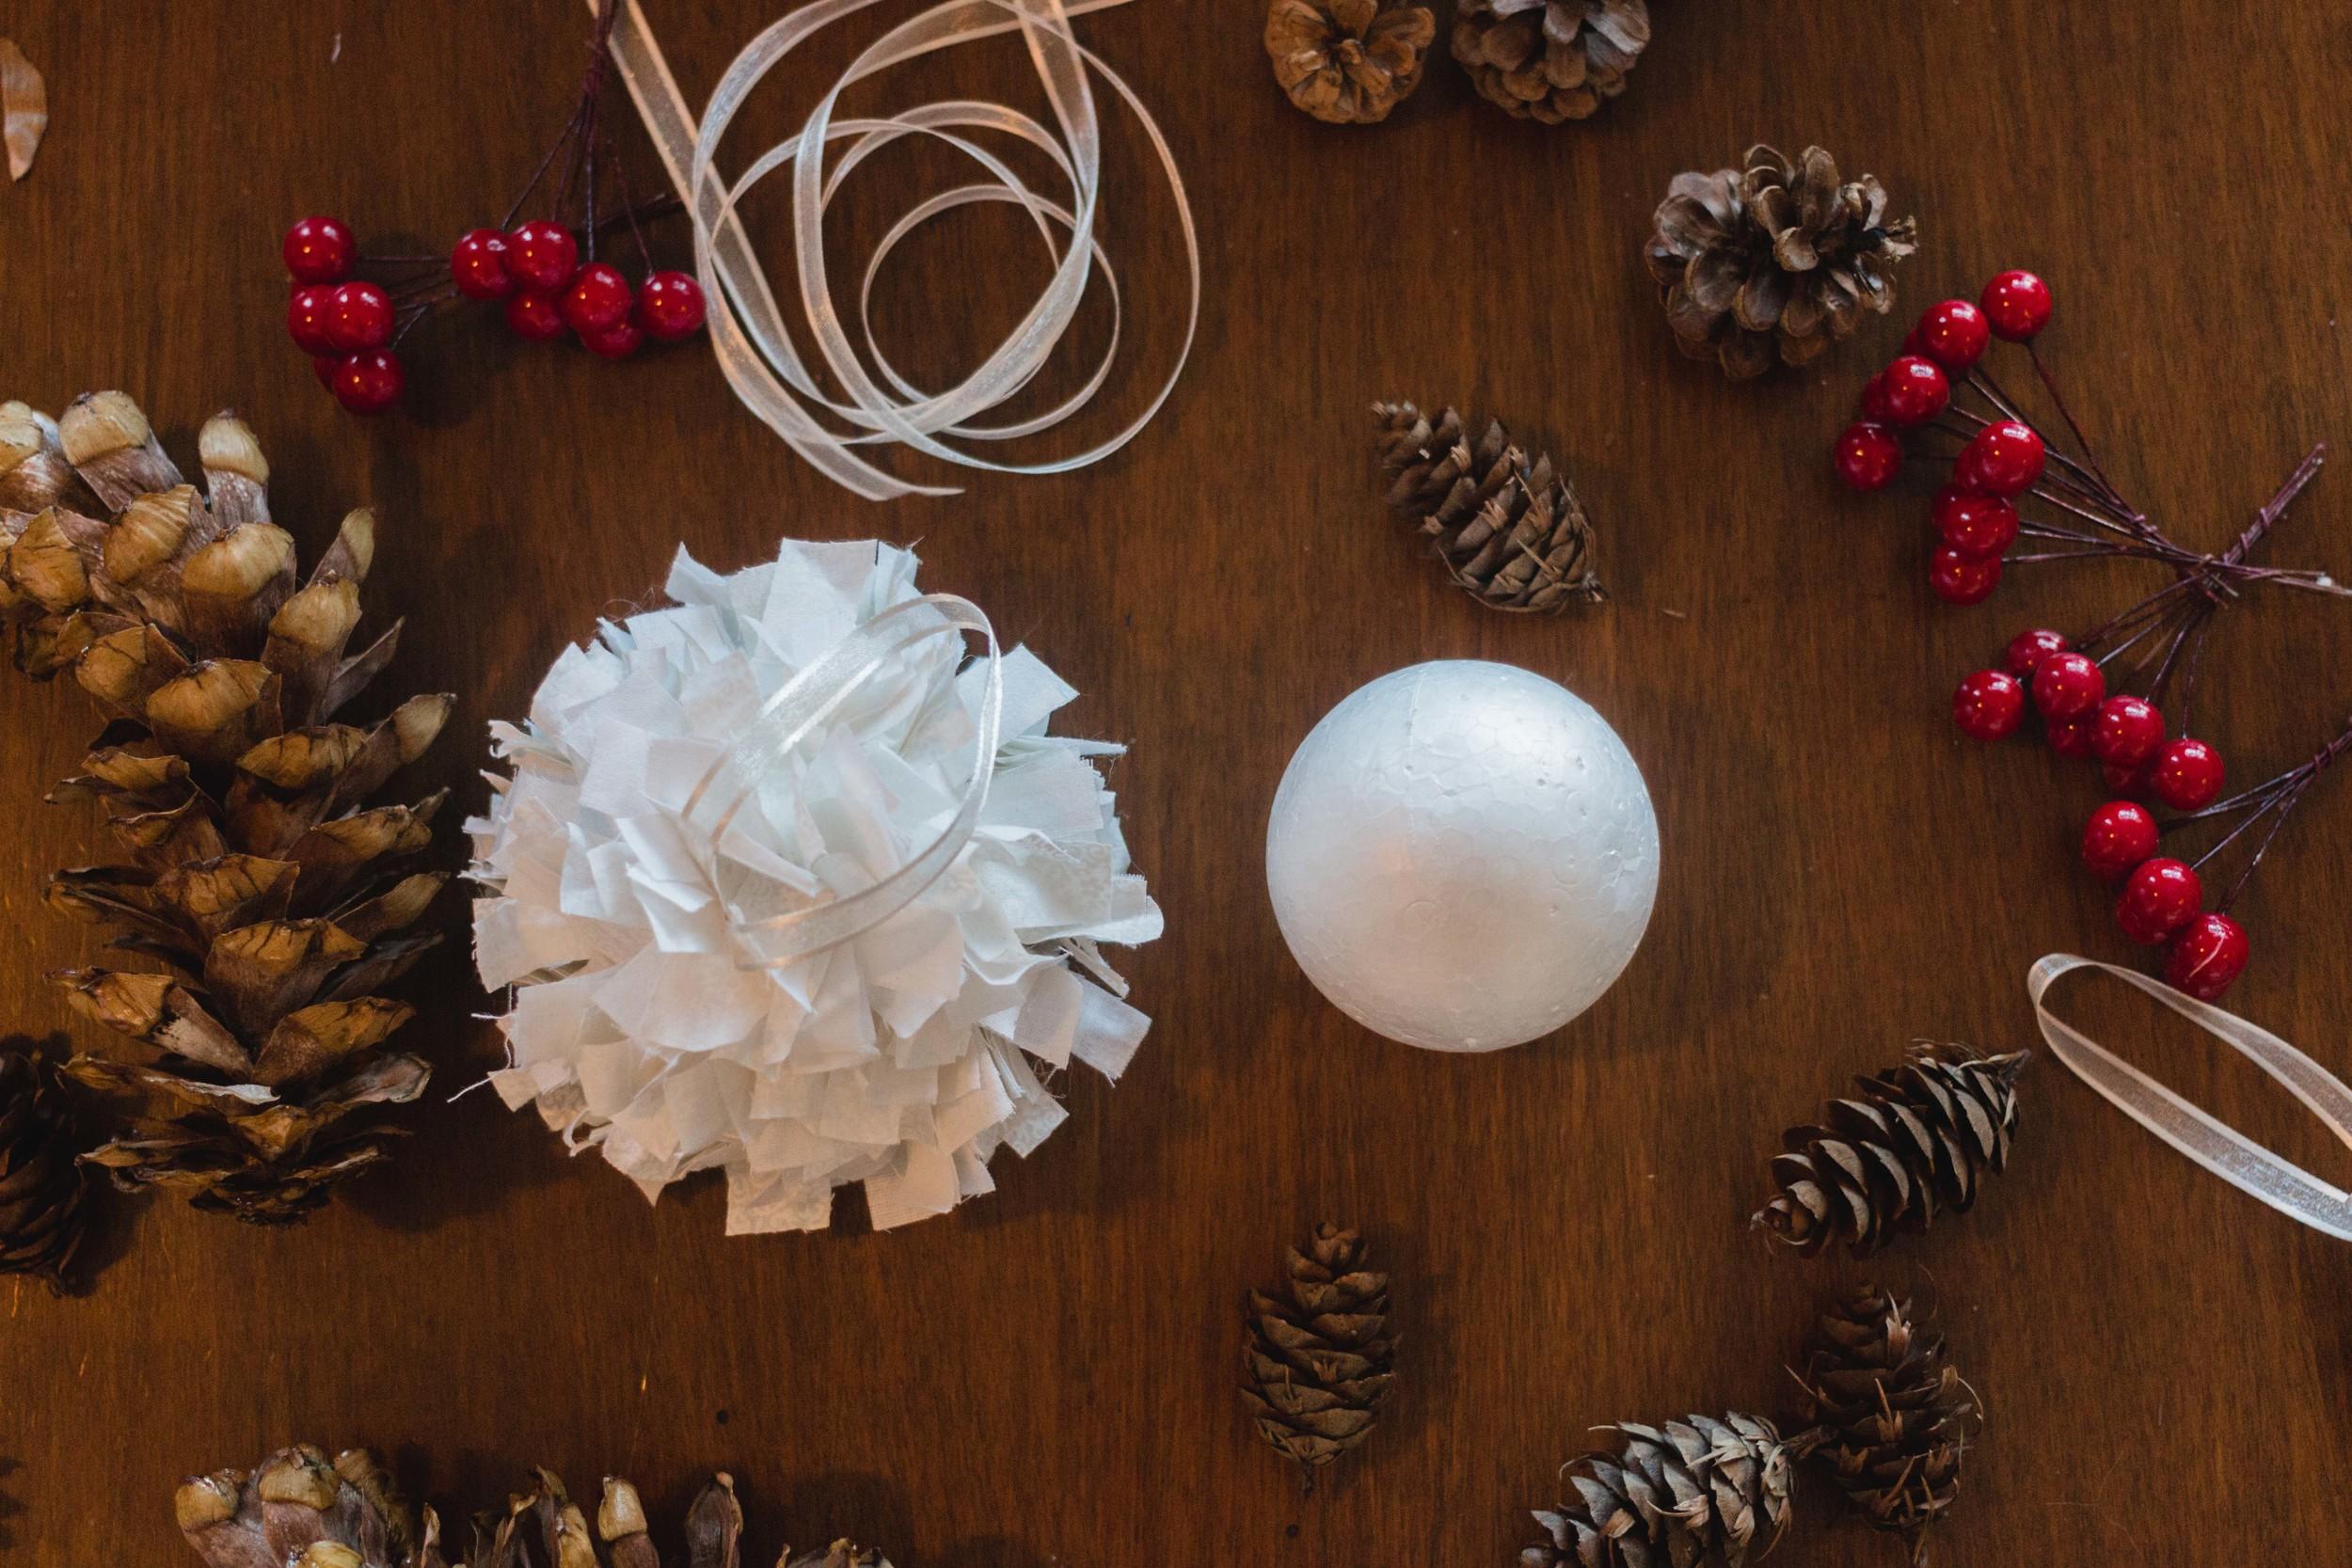 Pinecone Holiday DIY Easy Homemade Ornaments per natale styrofoam ball